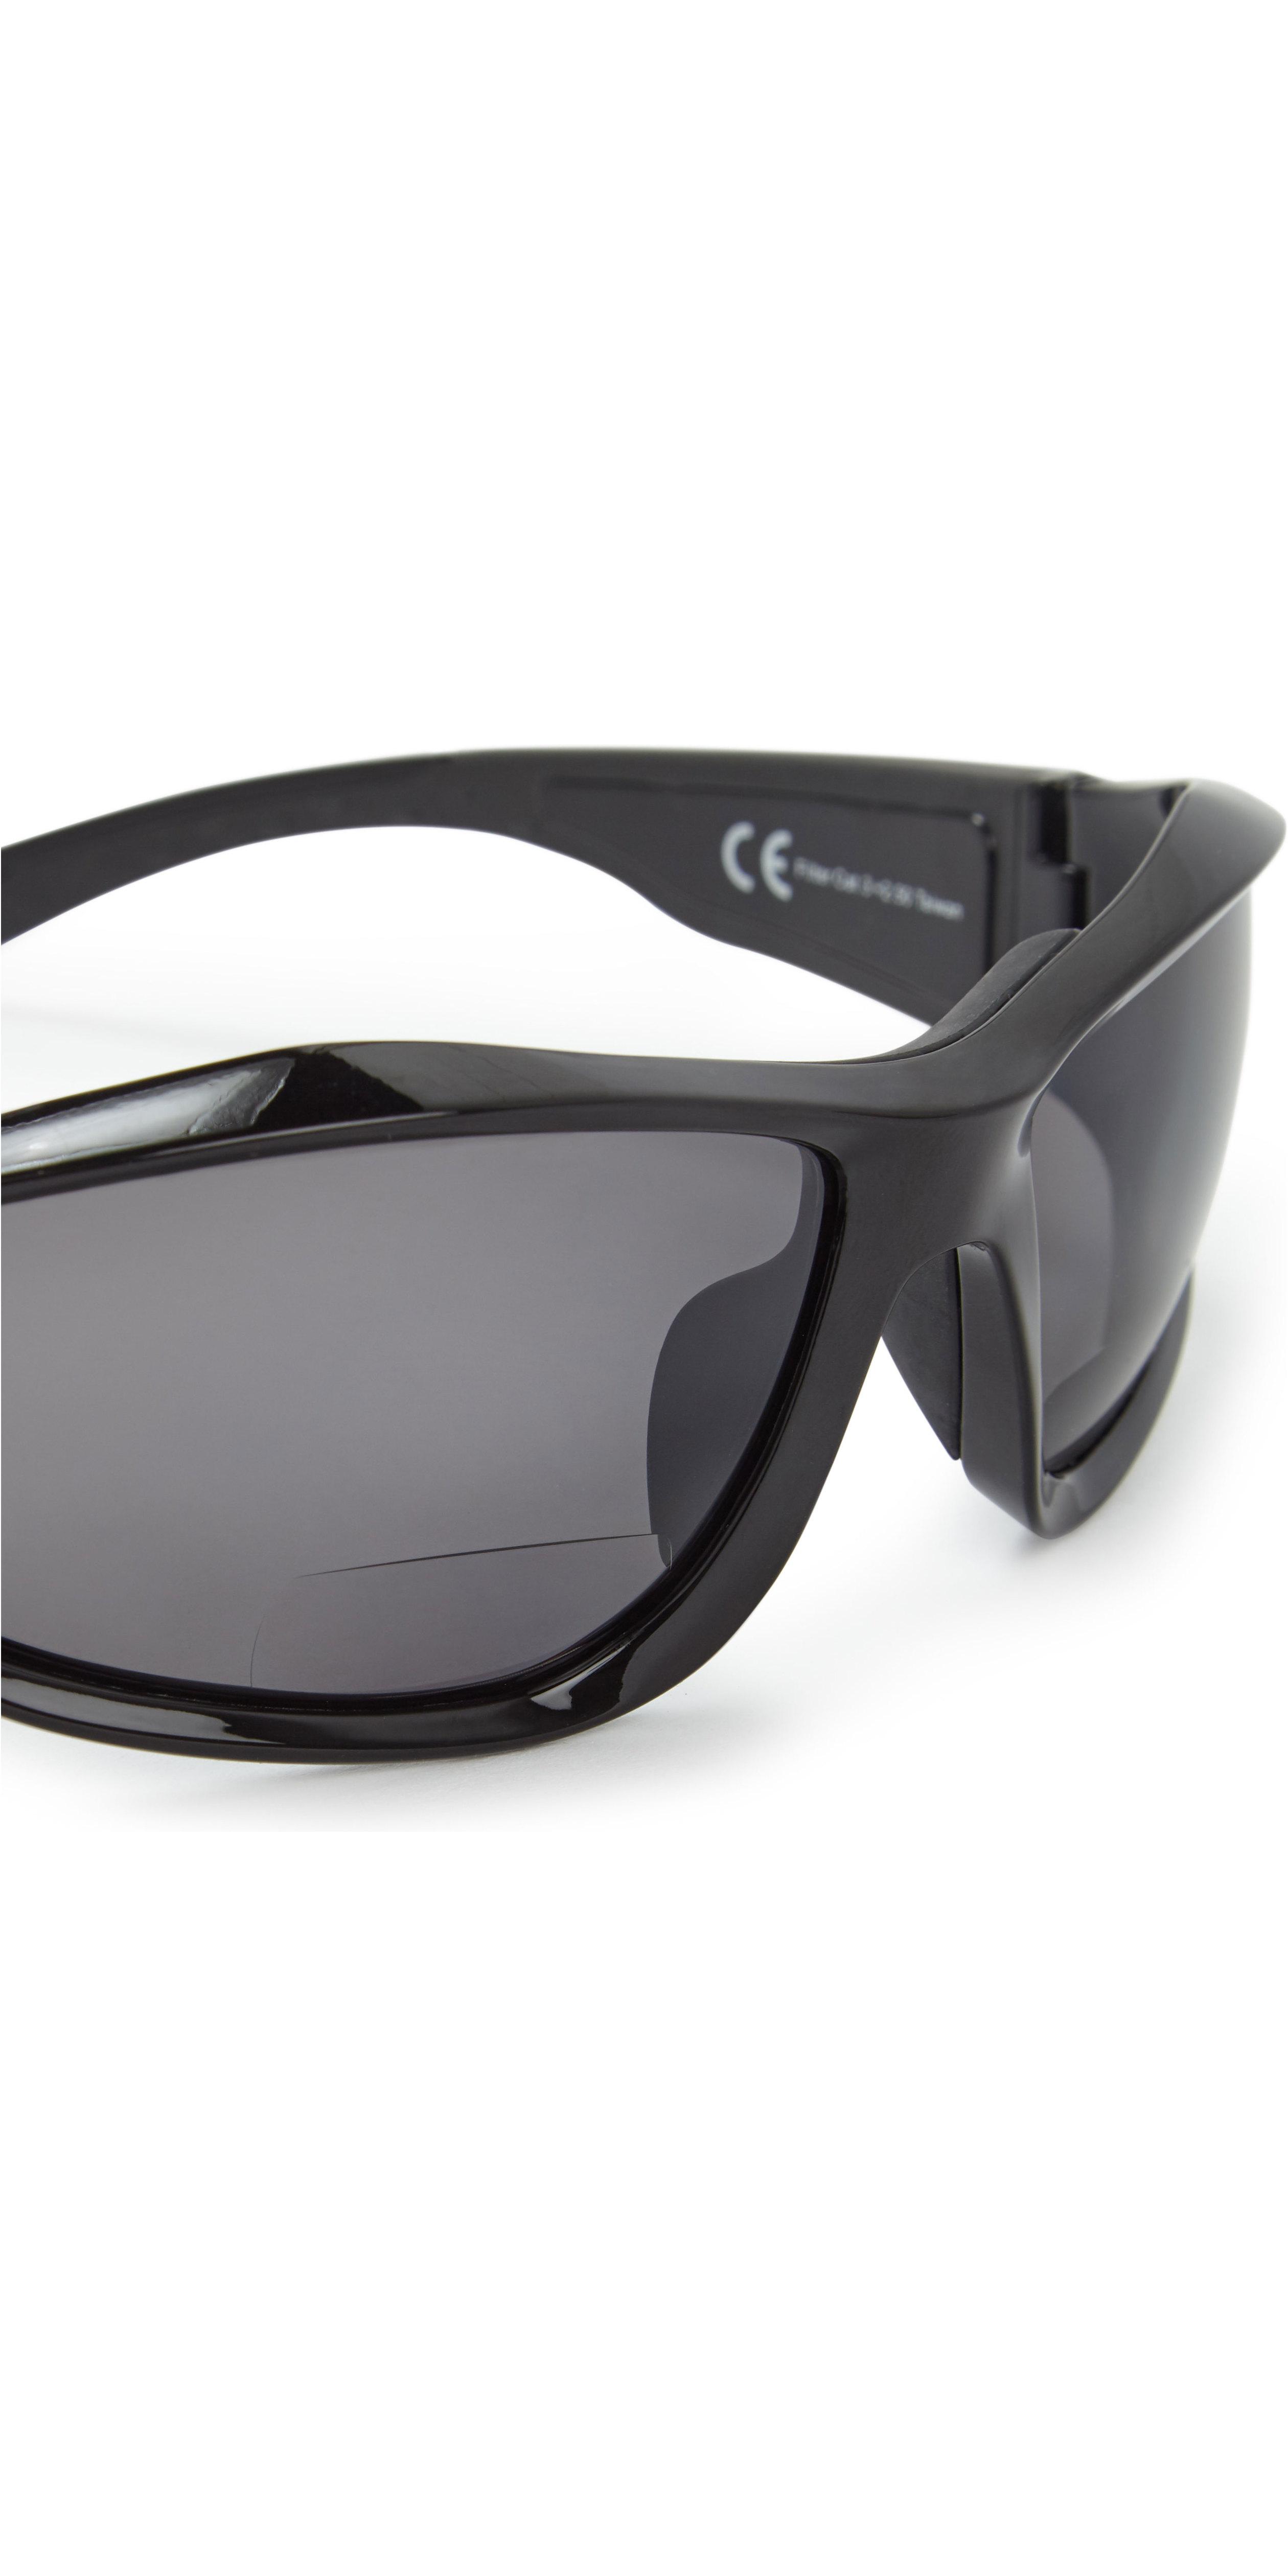 2019 Gill Race Vision Bi-focal Sunglasses Black / Smoke RS28